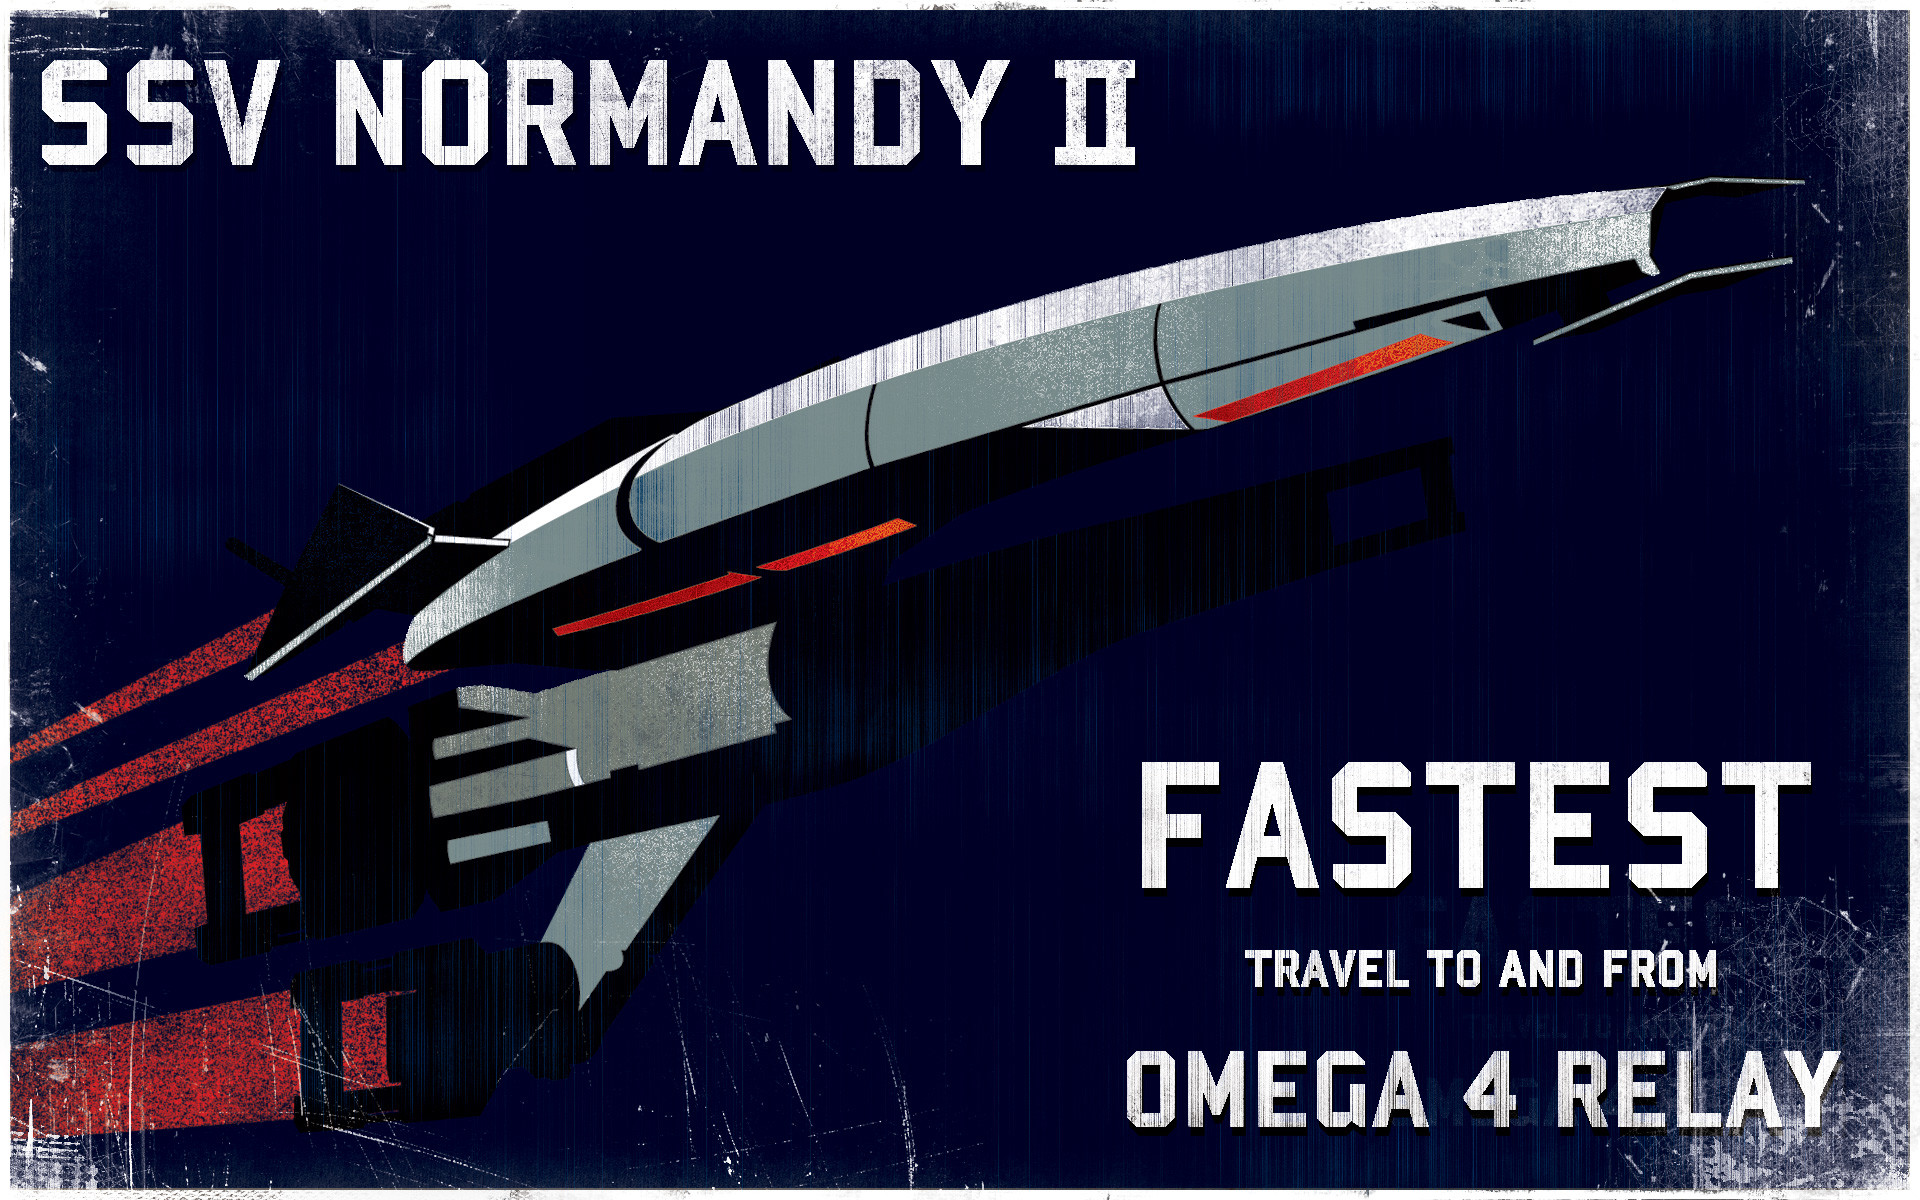 Sci Fi – Spaceship Mass Effect Wallpaper